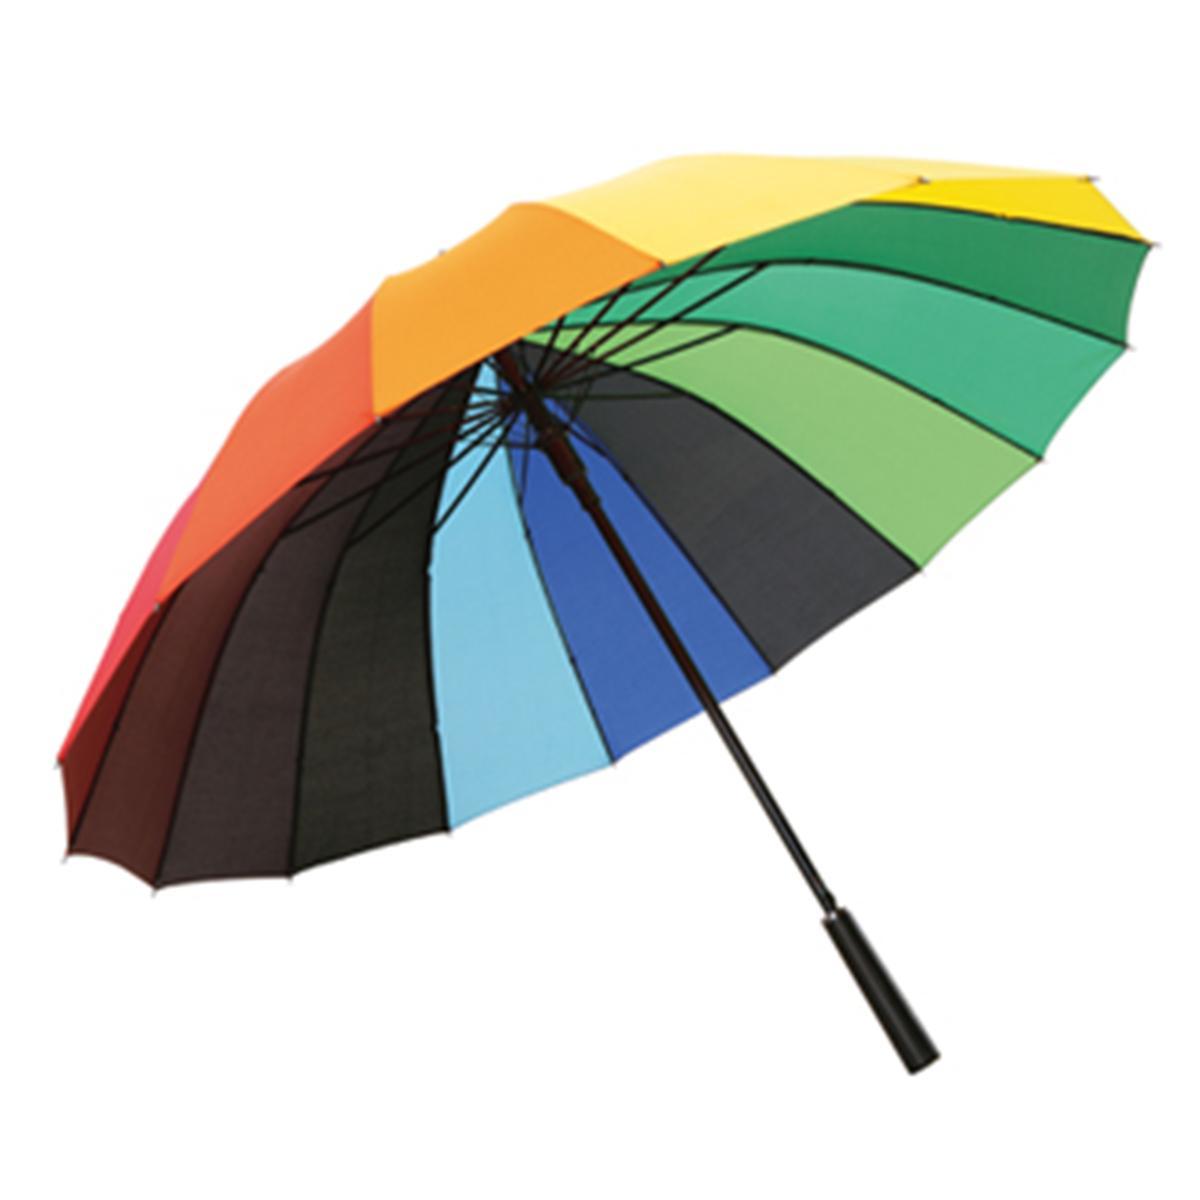 ���� ������ Rainbow 95 ��. (Rainbow)